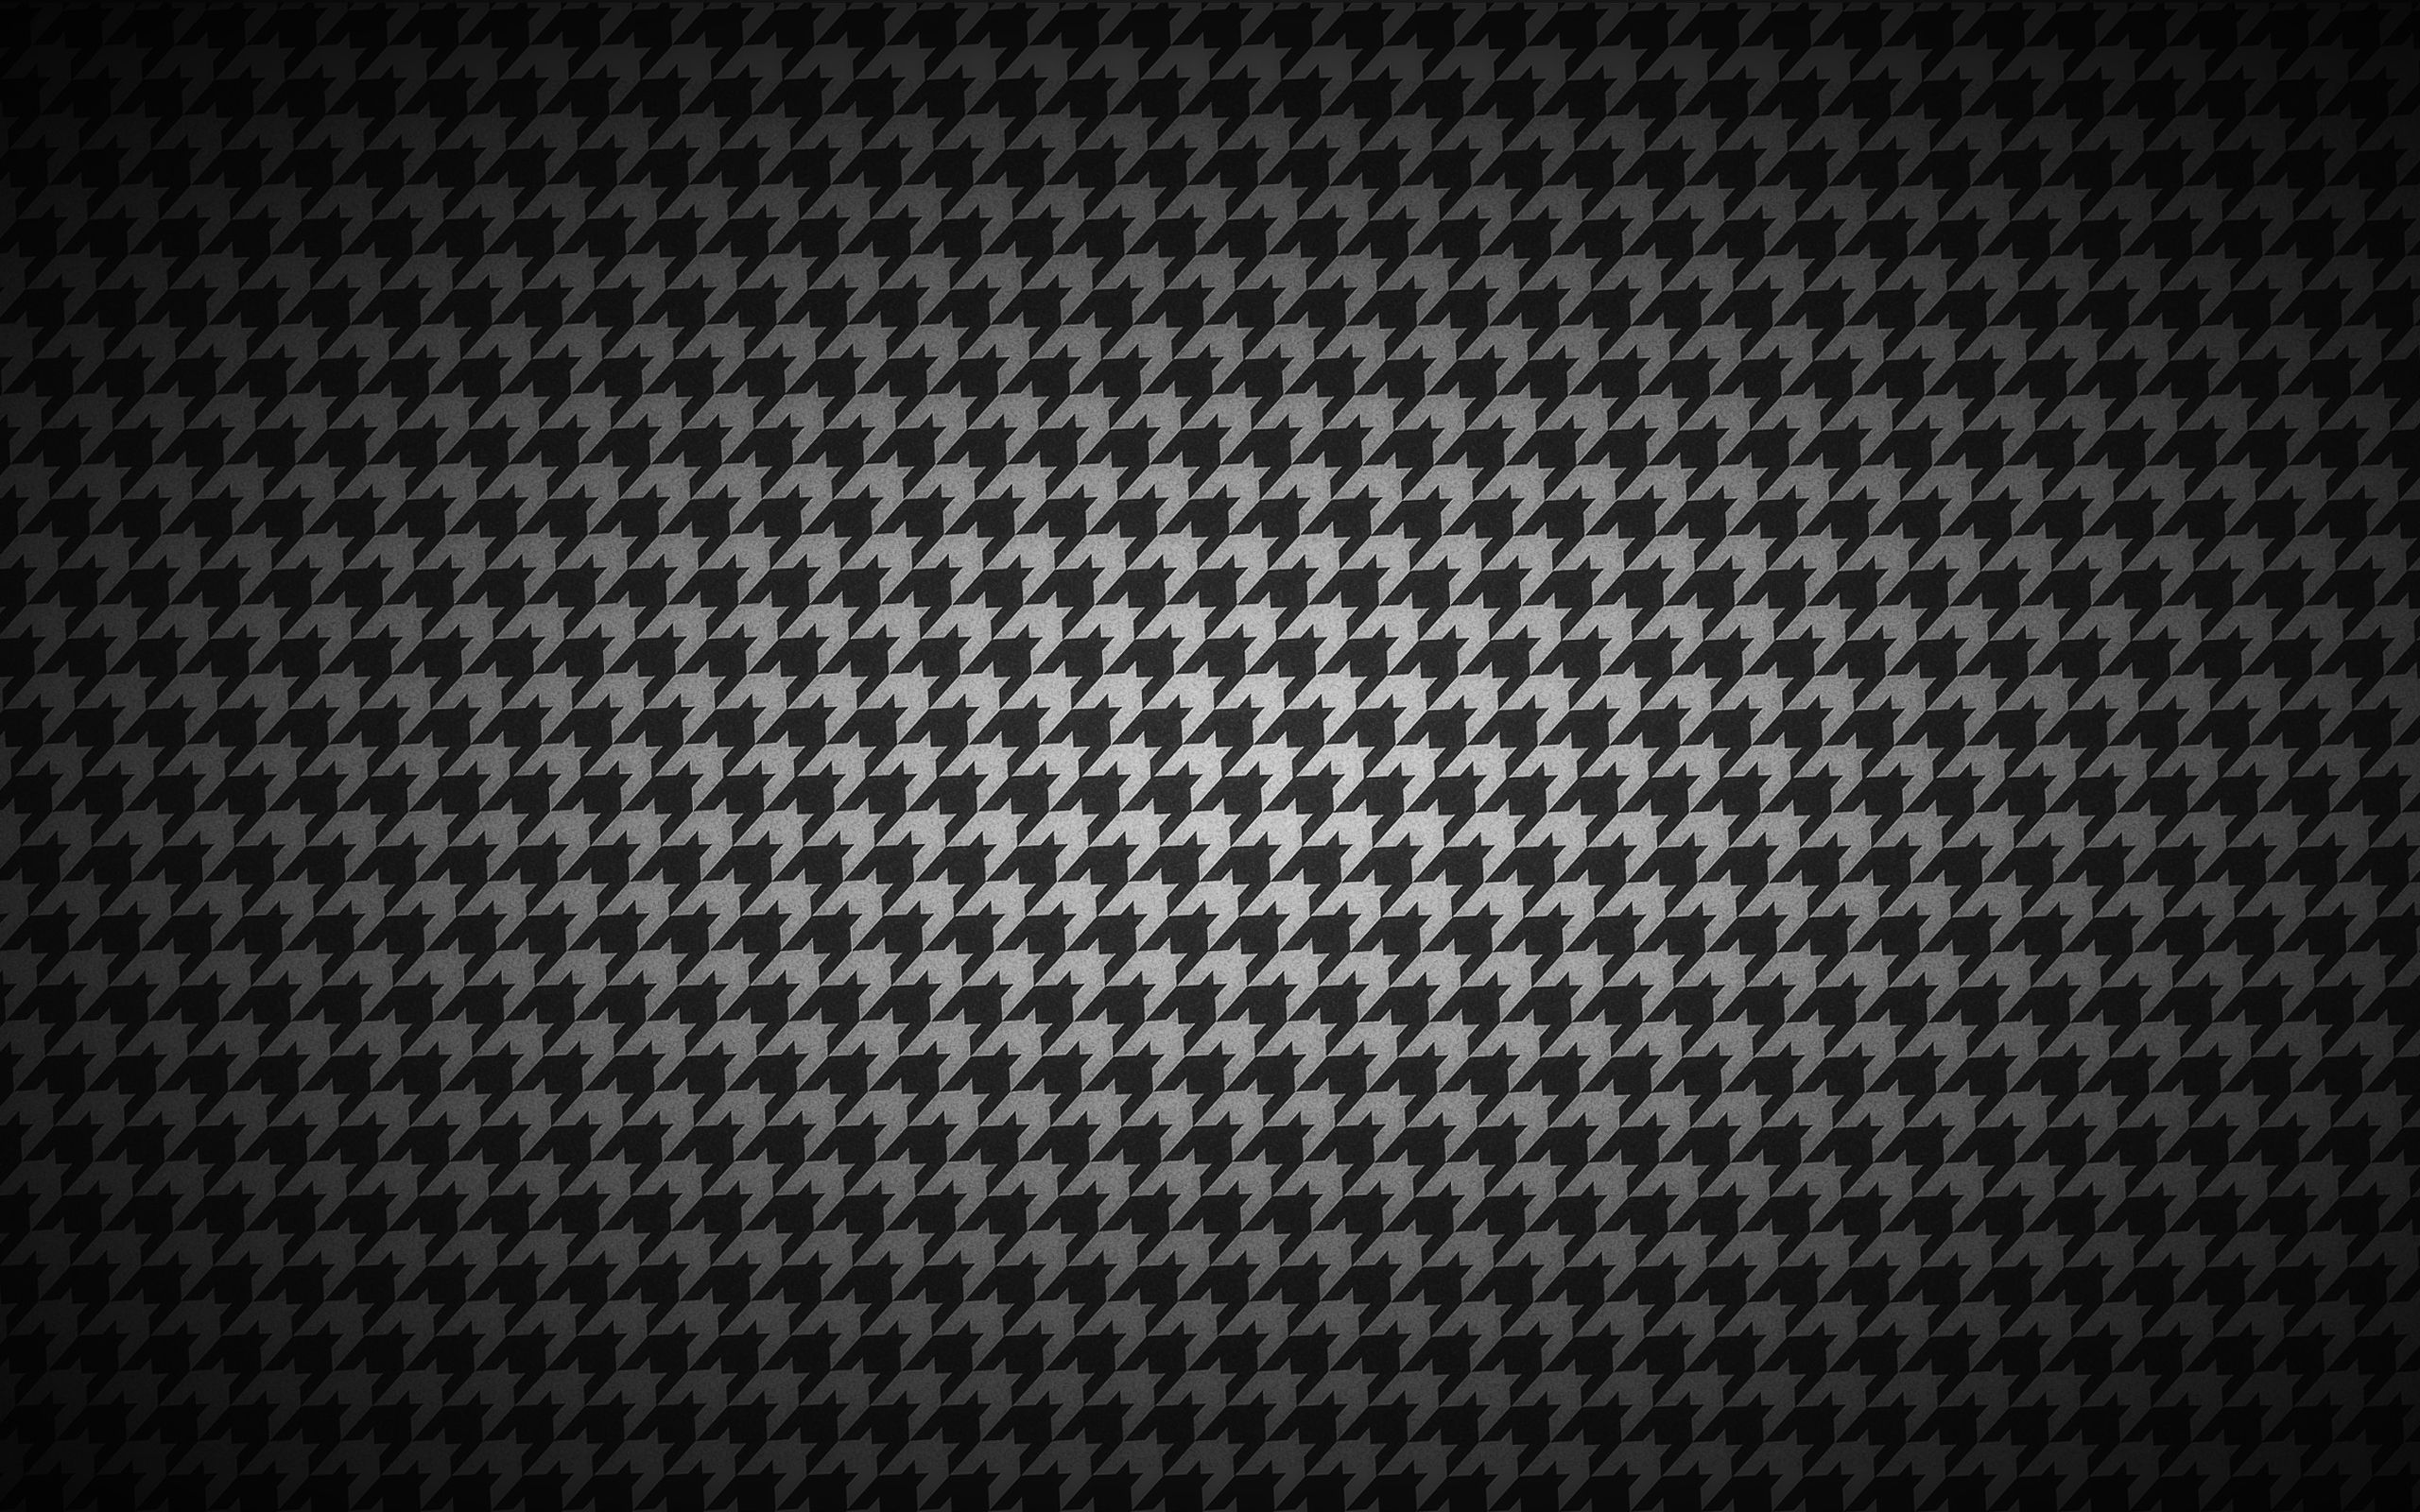 Classic Pattern Wallpaper 2560x1600 Textured Wallpaper Wallpaper Pattern Wallpaper